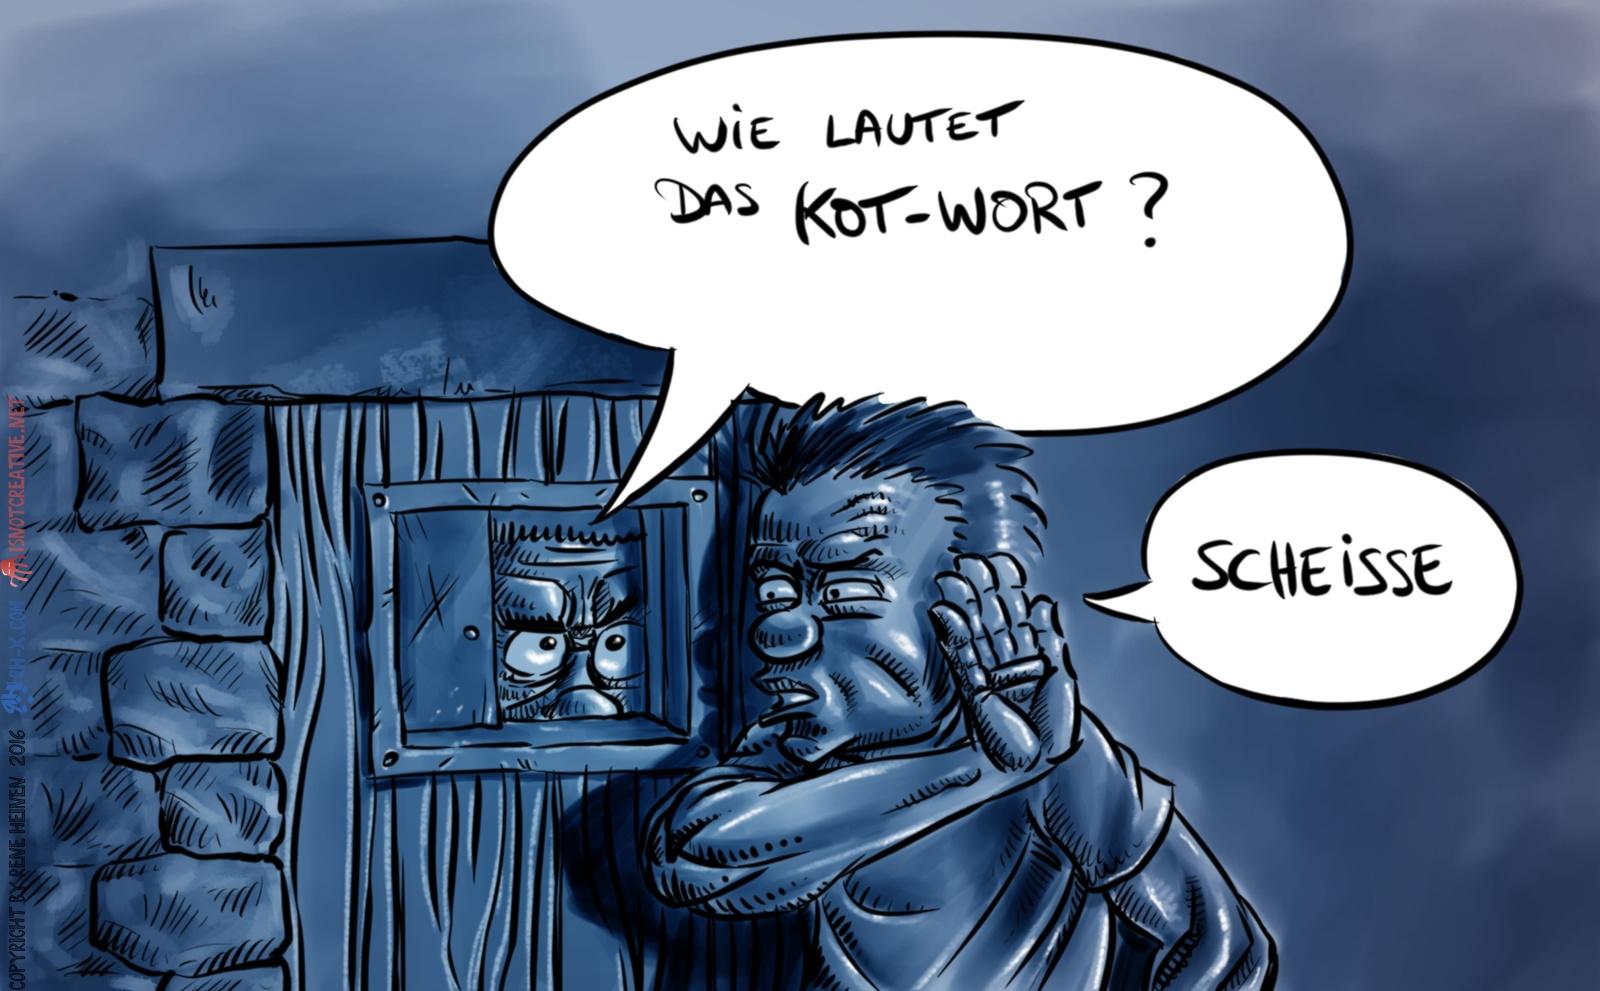 kotwort